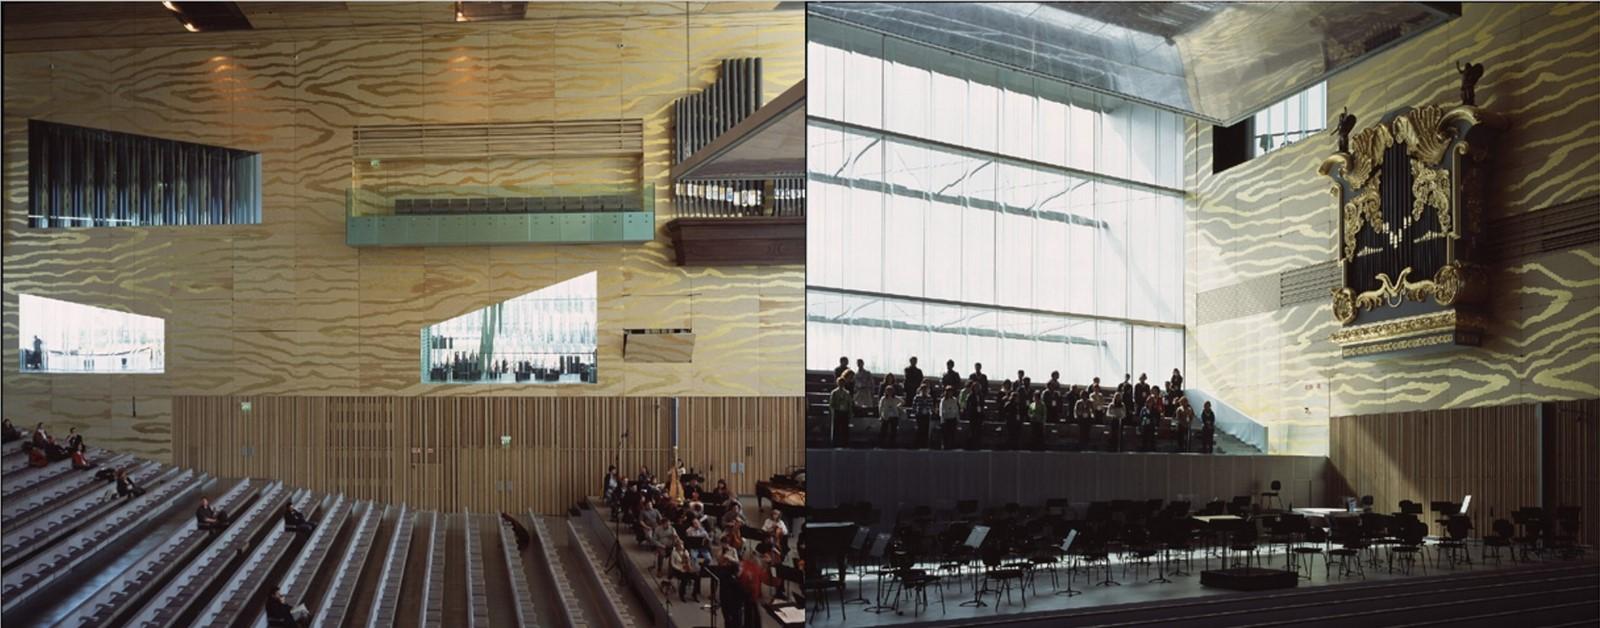 Casa Da Musica, Porto by Rem Koolhaas: The Asymmetrical Polyhedron - Sheet8